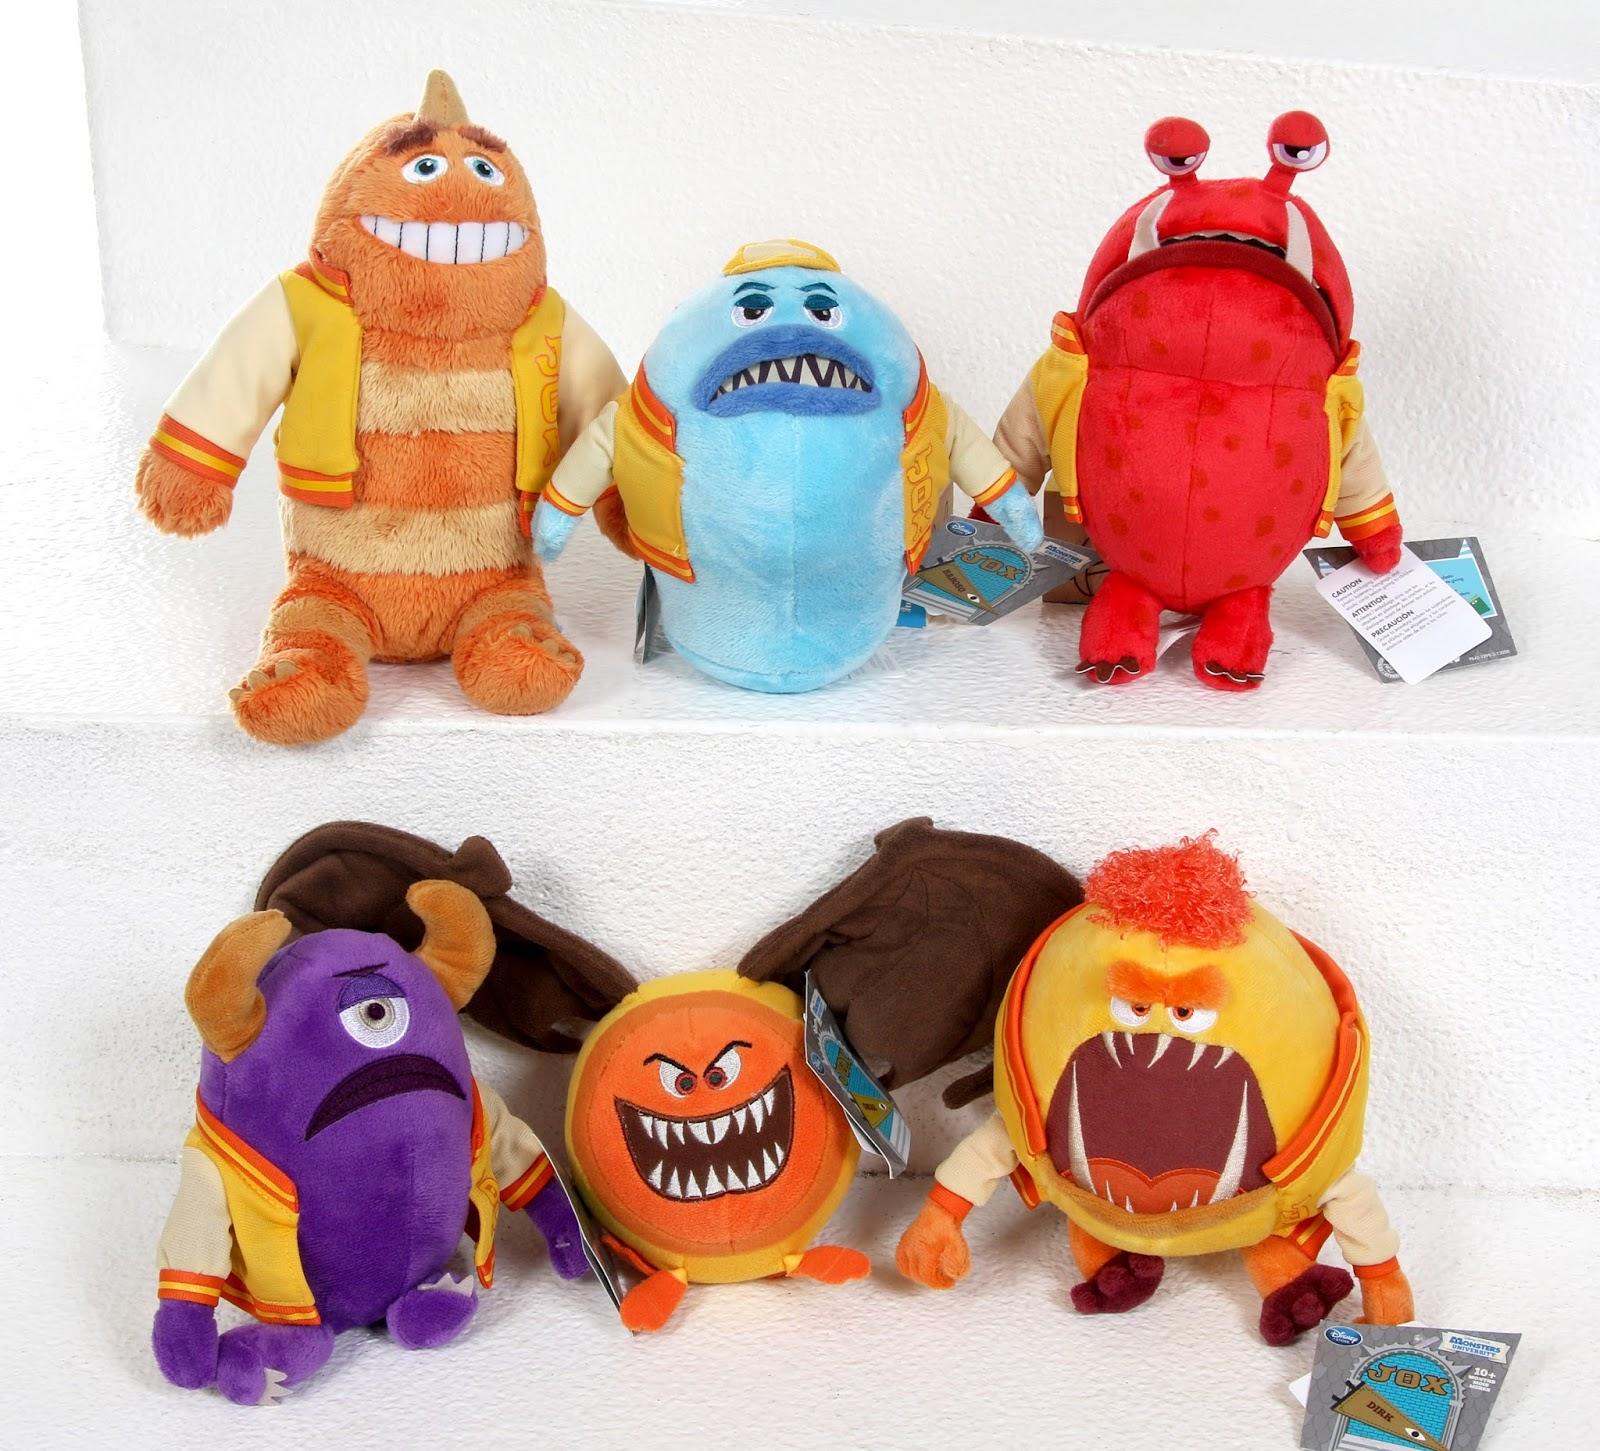 monsters university disney store JOX plush